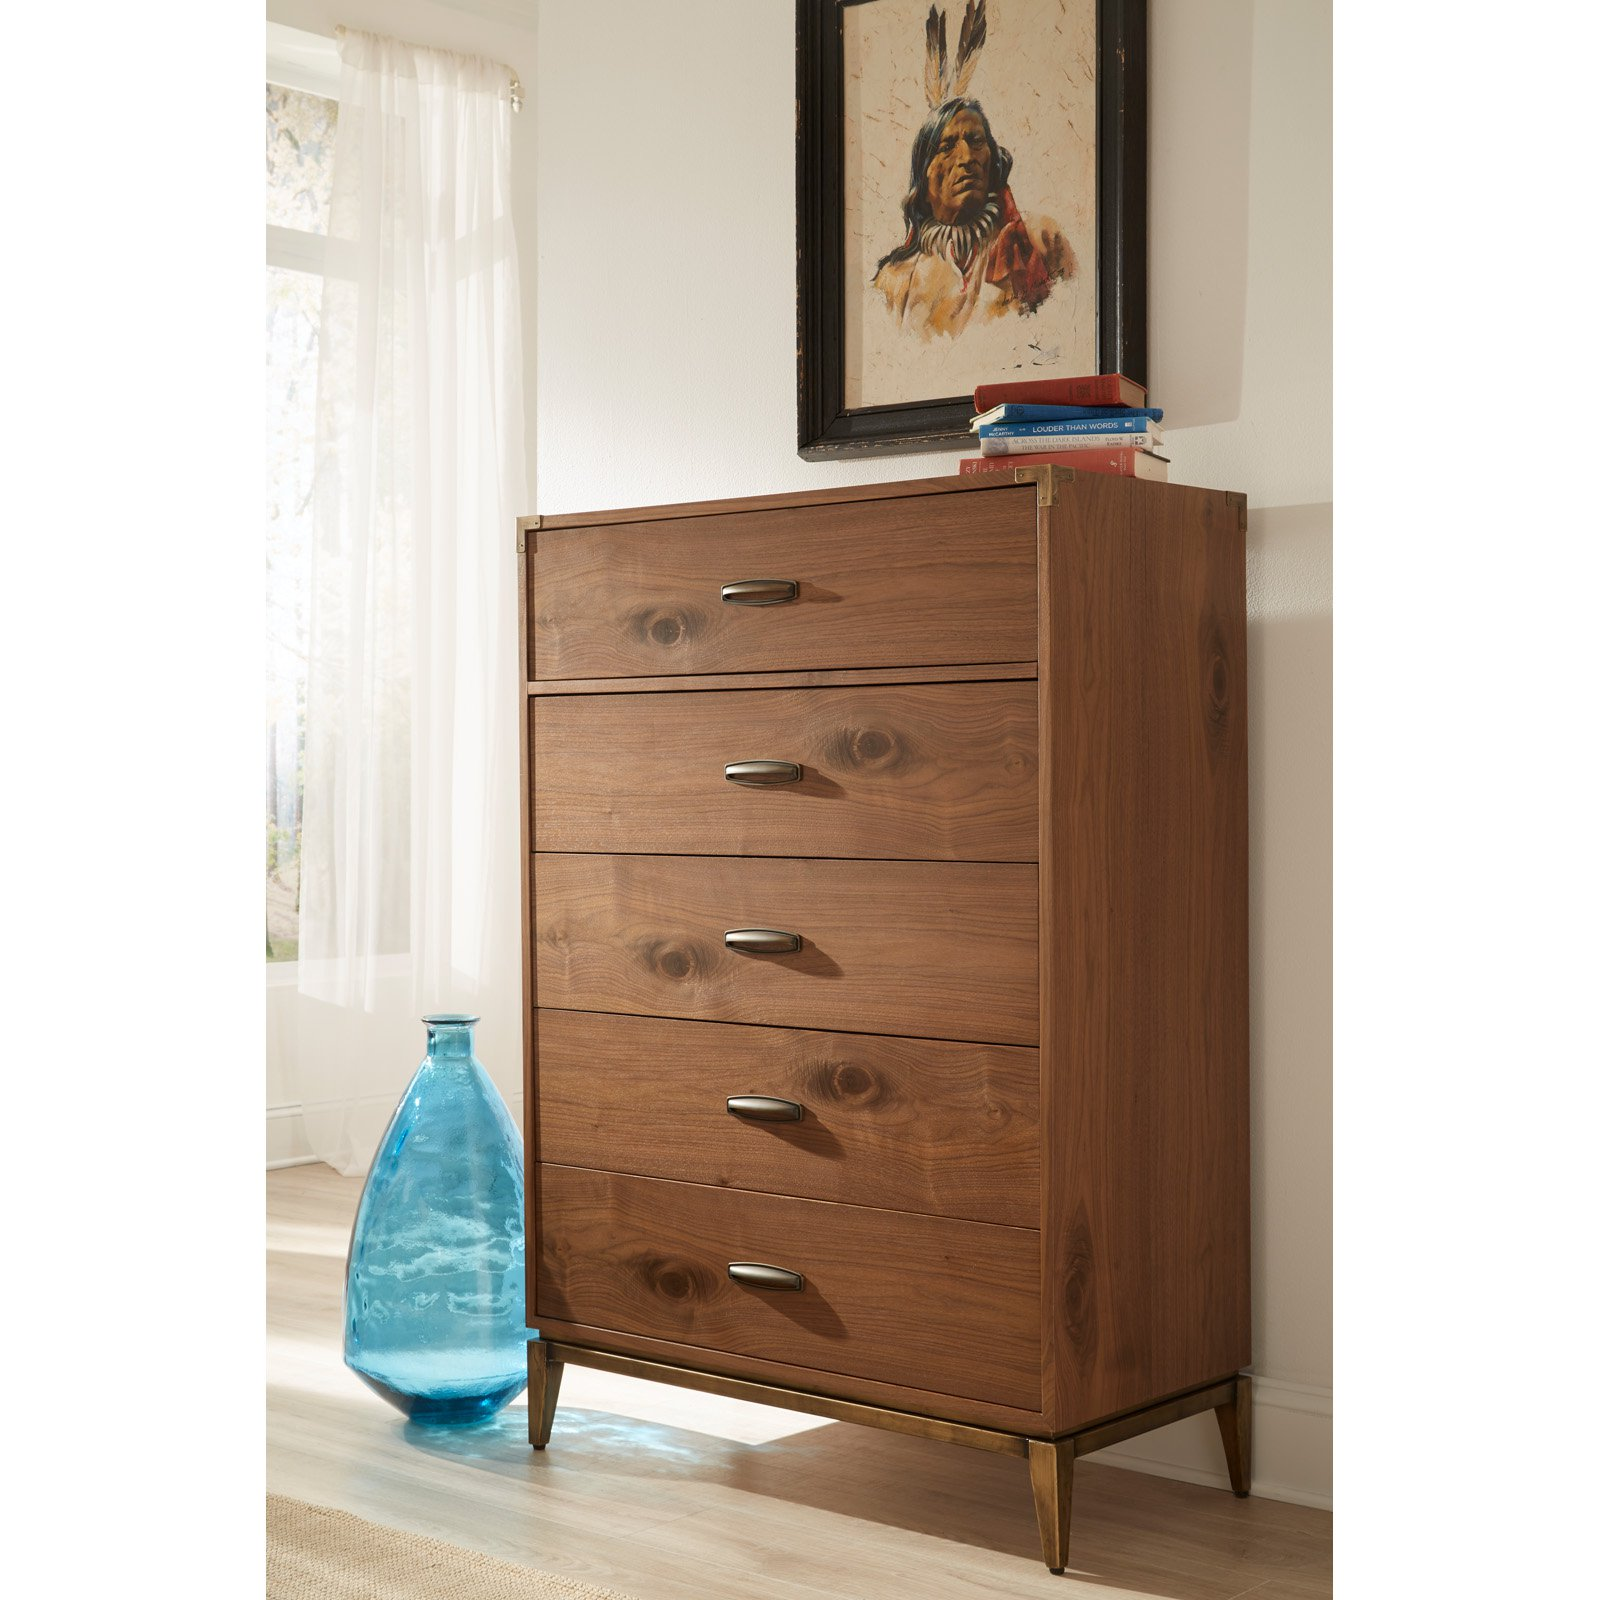 Modus Adler 5-Drawer Chest by Modus Furniture